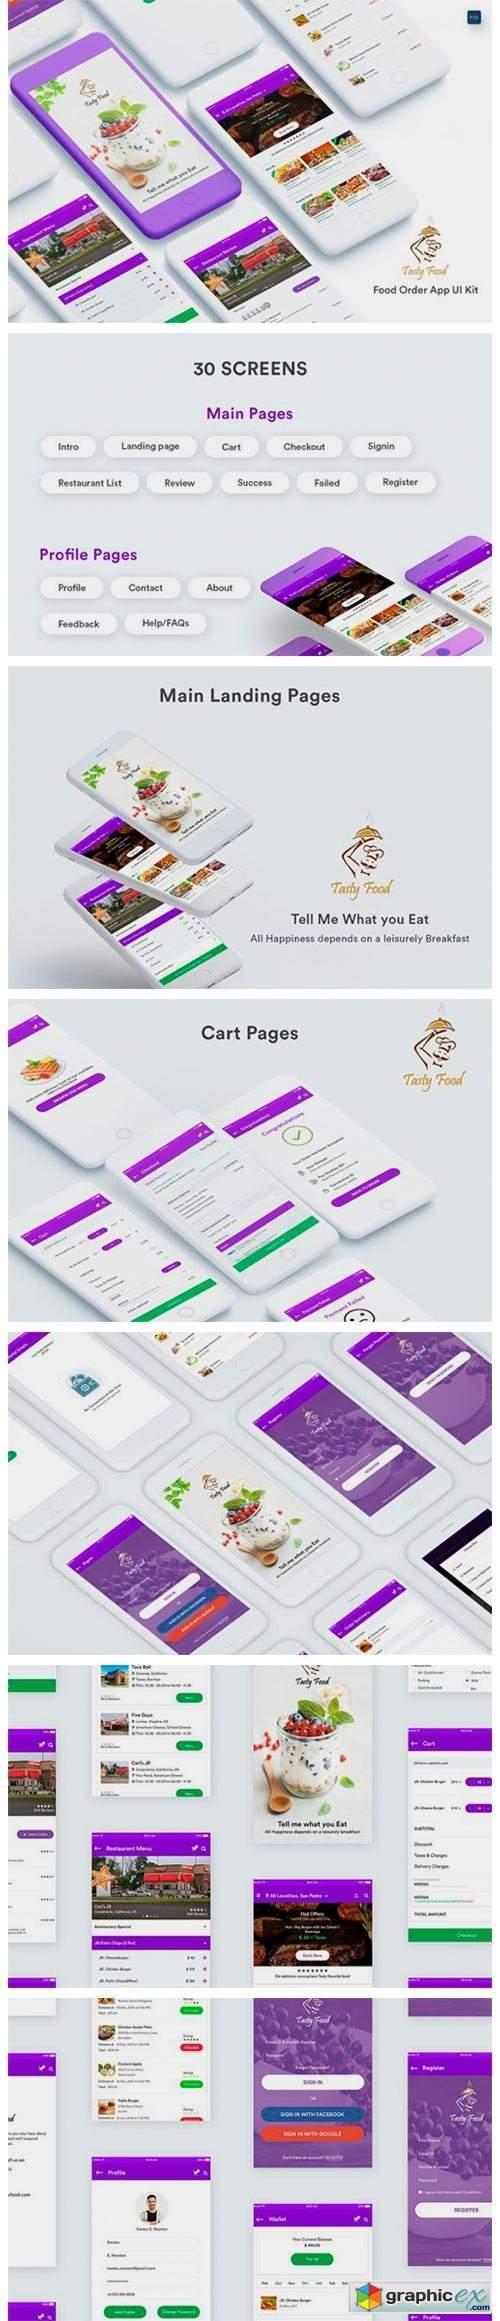 Online Food Order Mobile App UI Kit